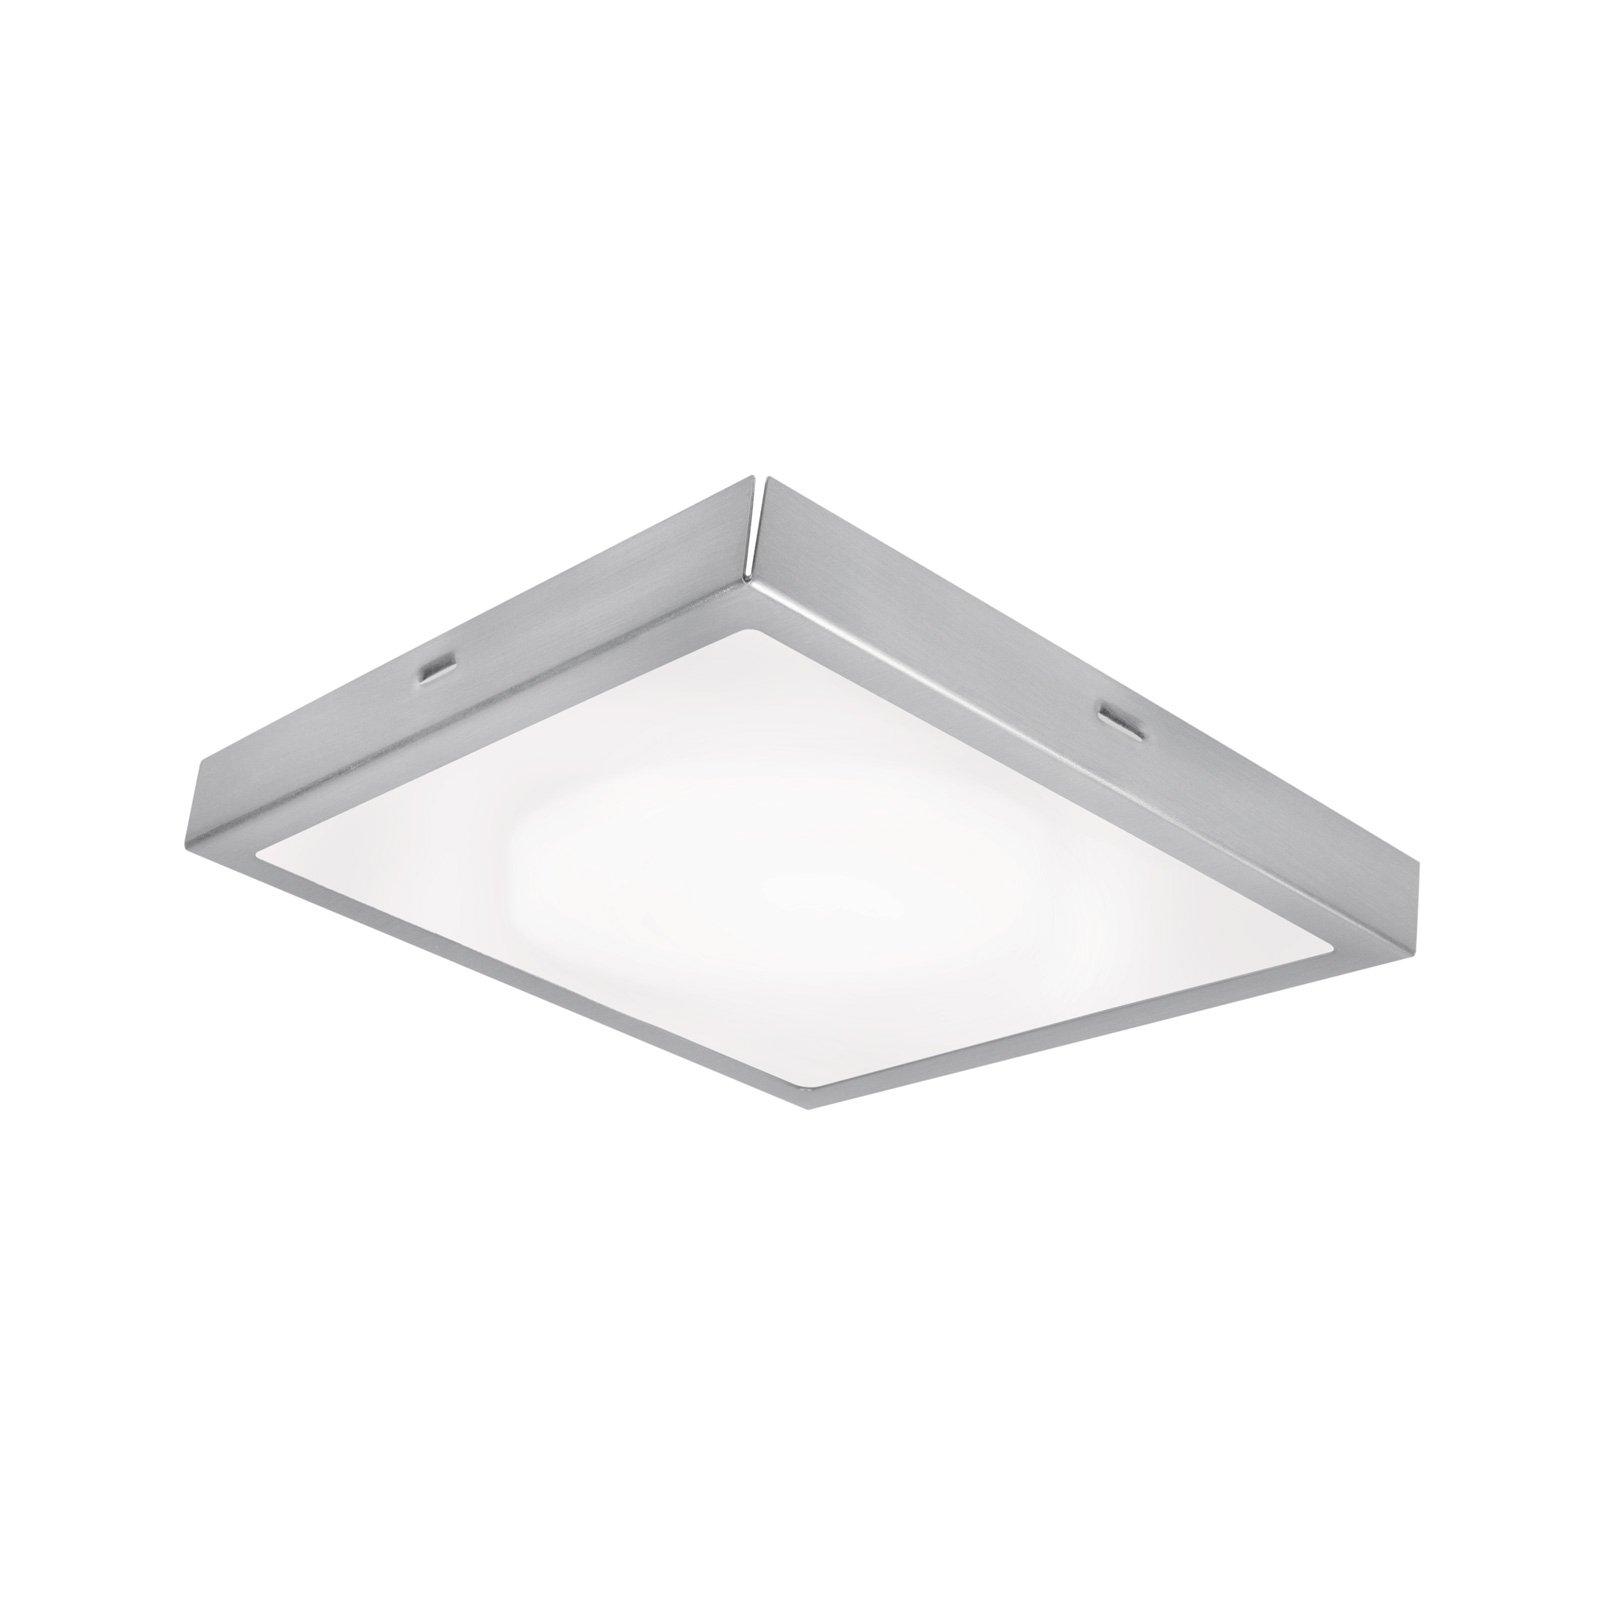 LEDVANCE Lunive Vela LED-taklampe 22cm 3 000 K